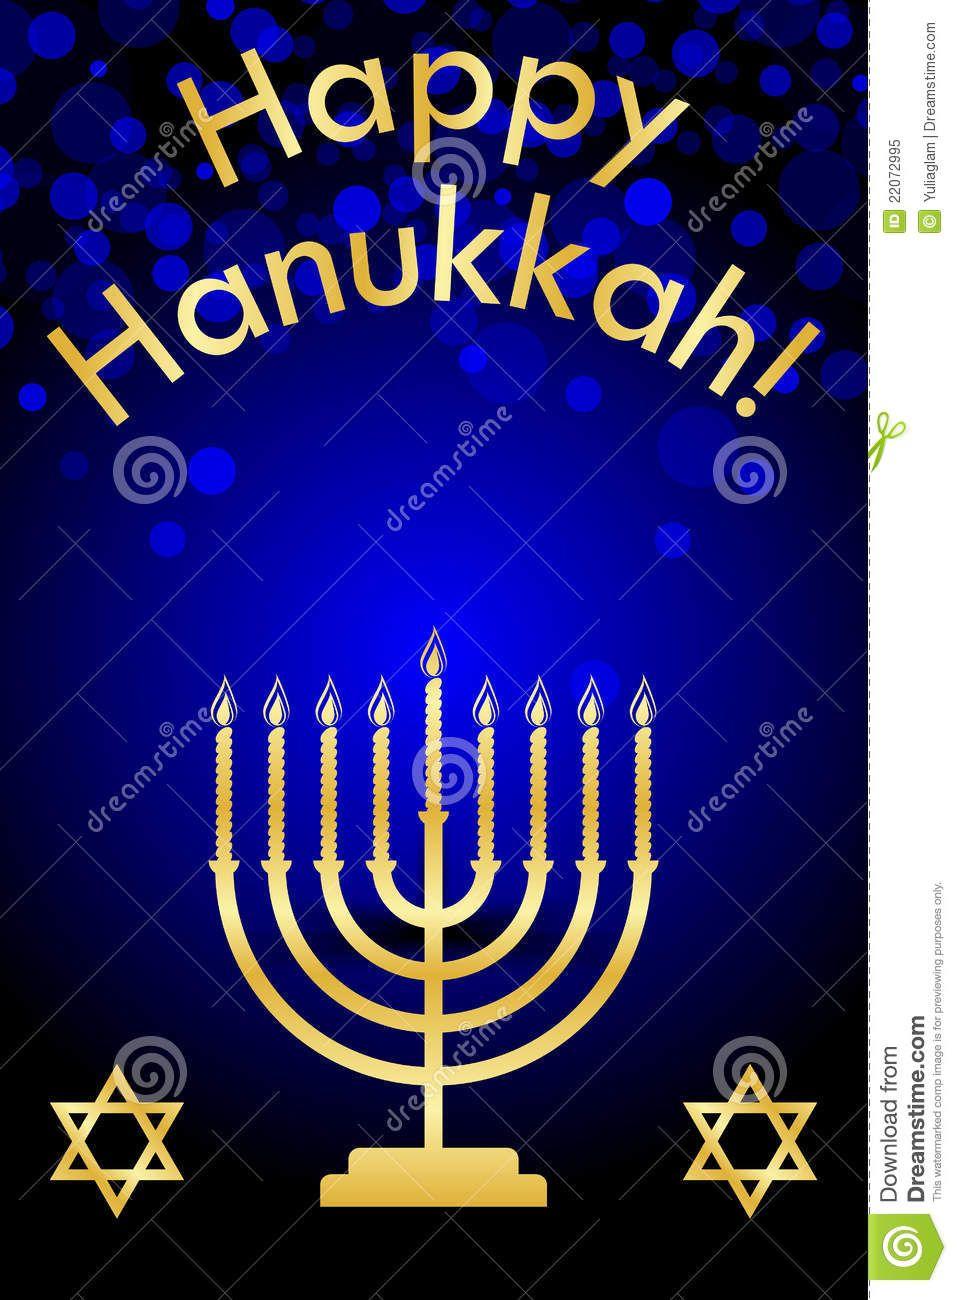 Happy Hanukkah Images Free Happy Hanukkah Happy Hanukkah Images Hanukkah